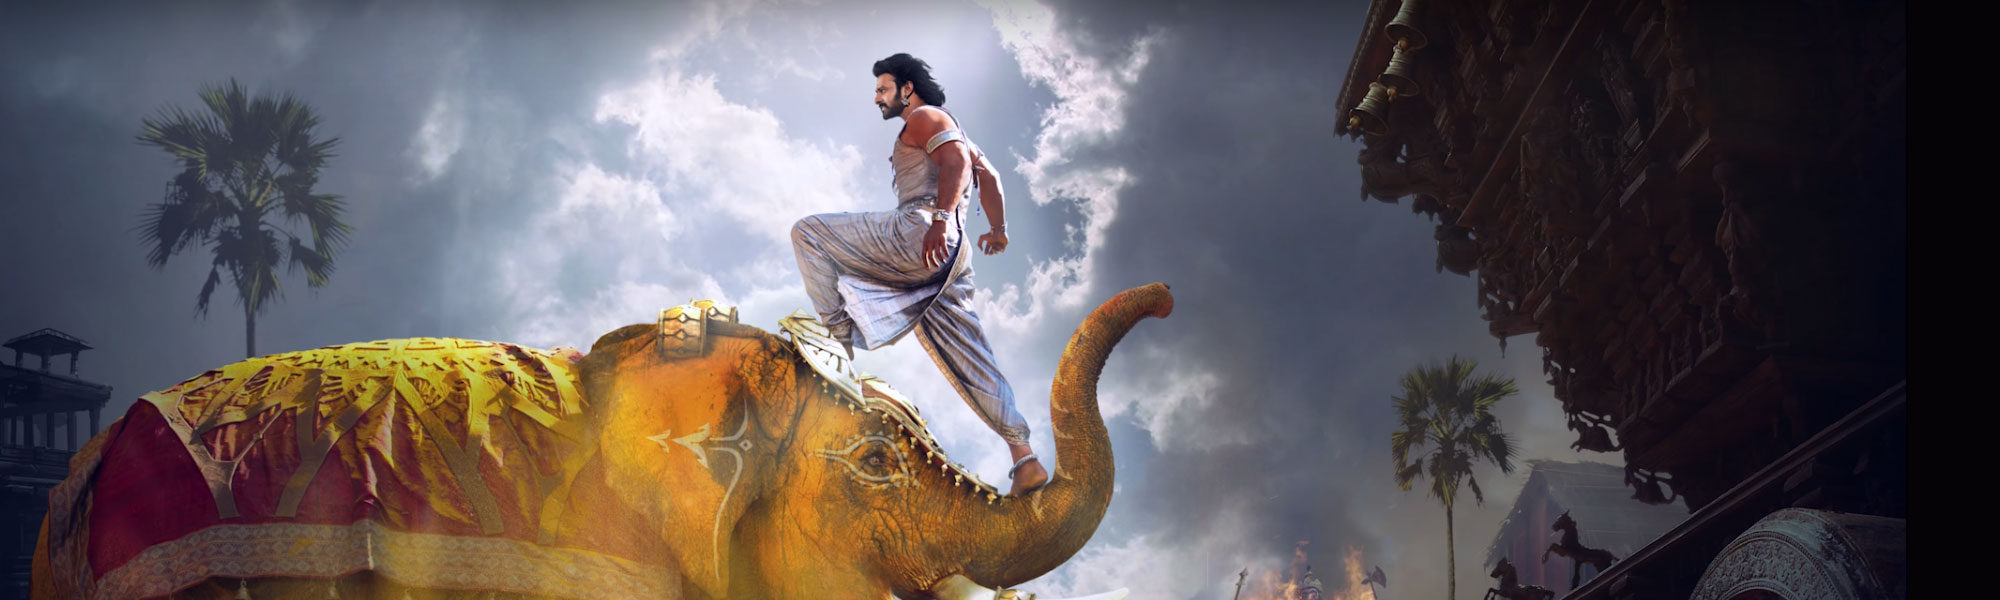 baahubali-2-maha-shivratri-motion-poster